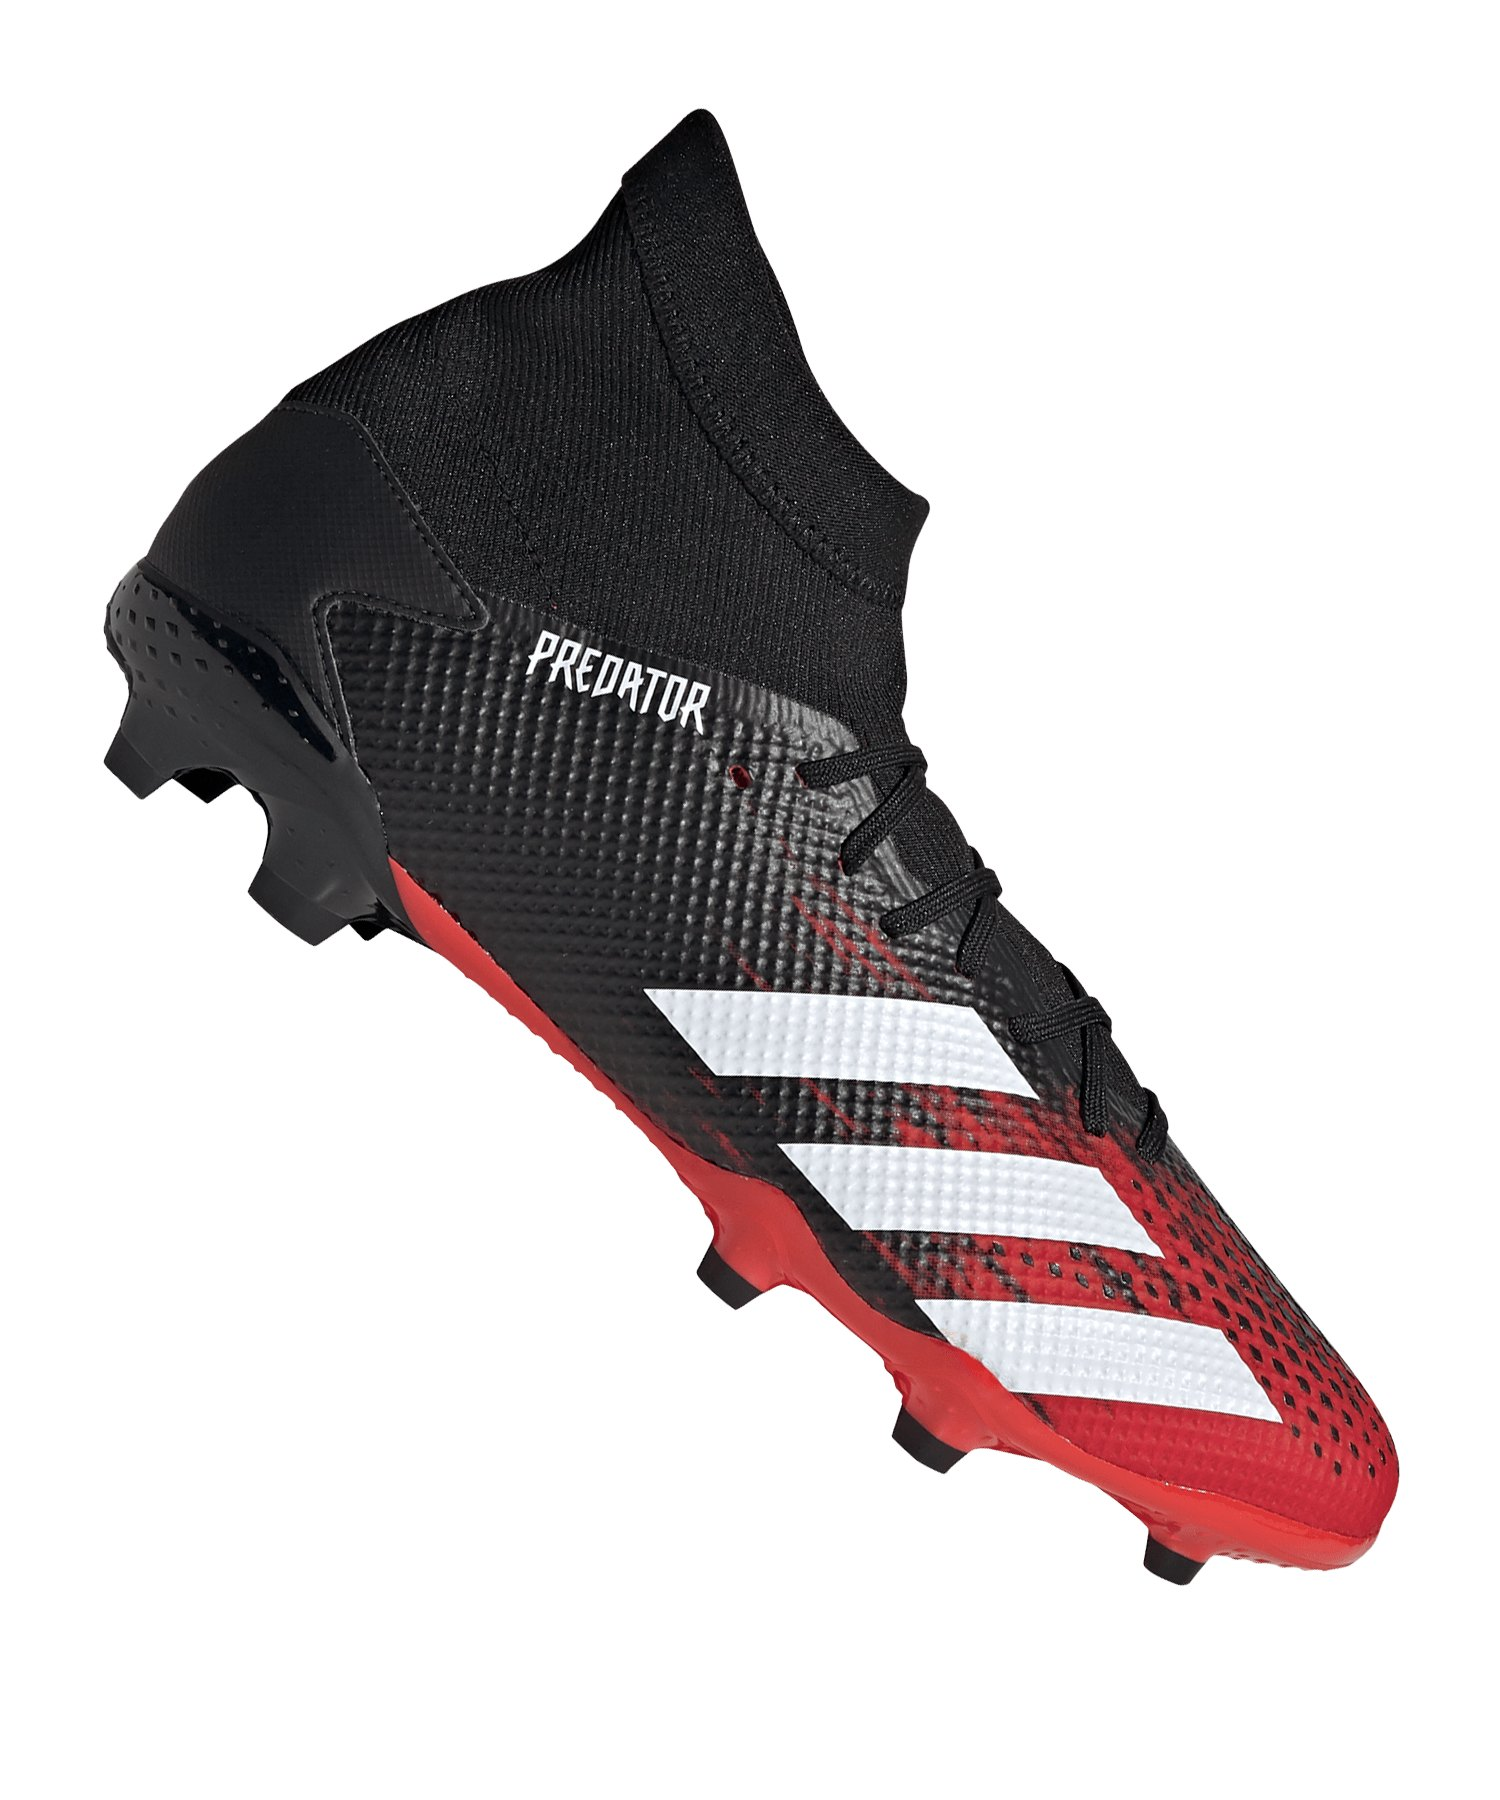 adidas Predator Mutator 20.3 FG Schwarz Rot - schwarz